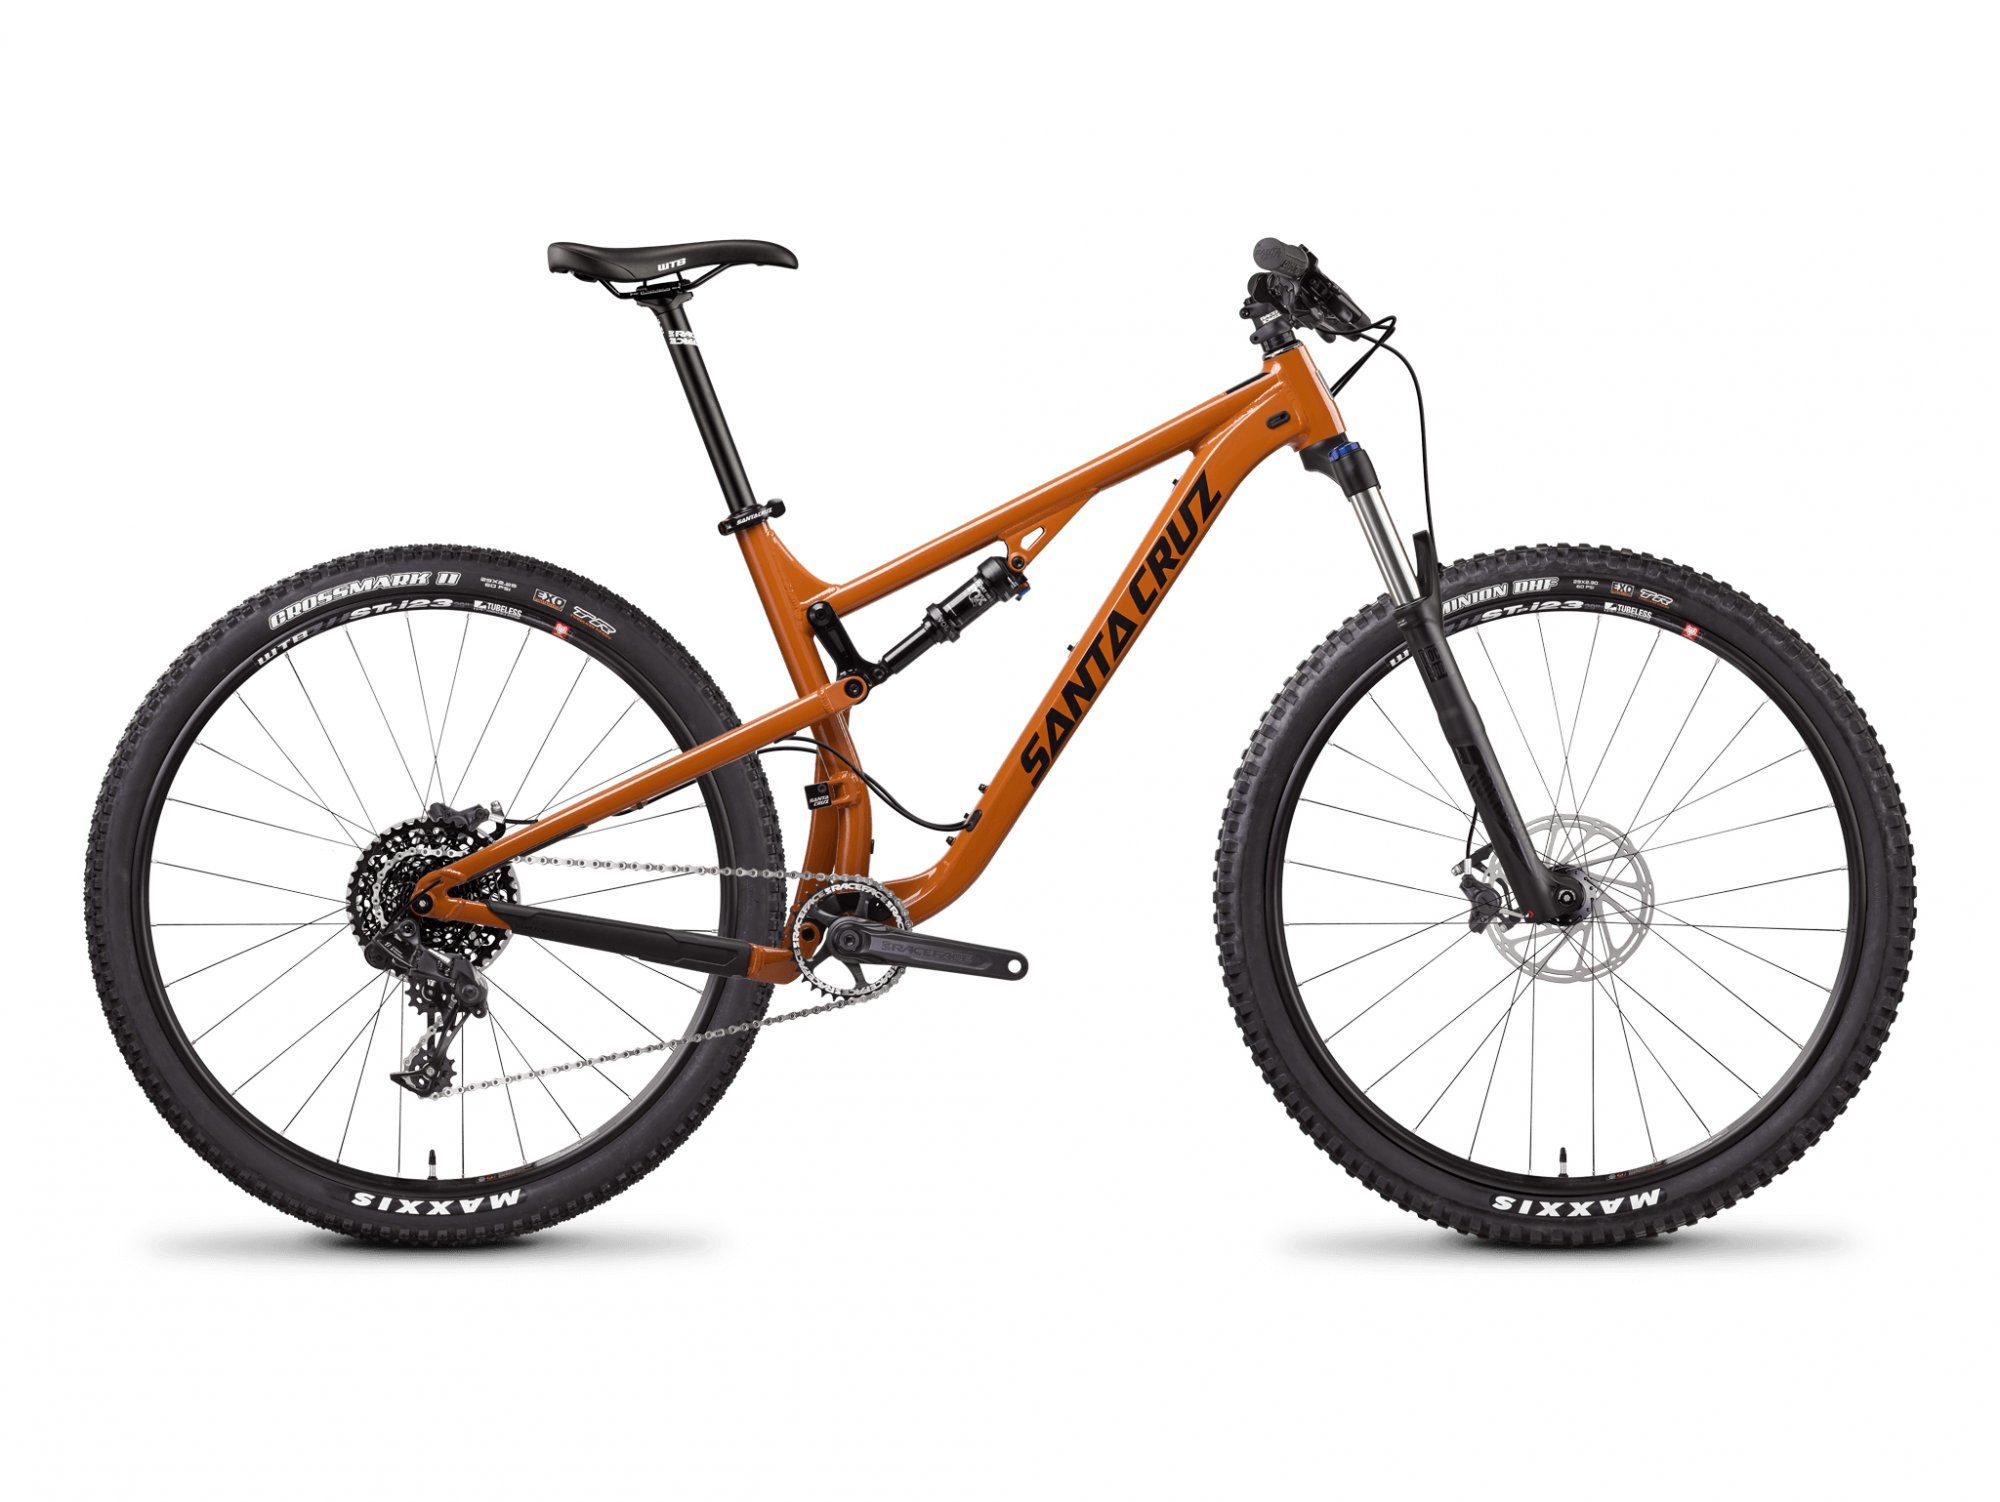 2018 Santa Cruz Tallboy C 27.5+ R Kit - Gloss Rust / Black